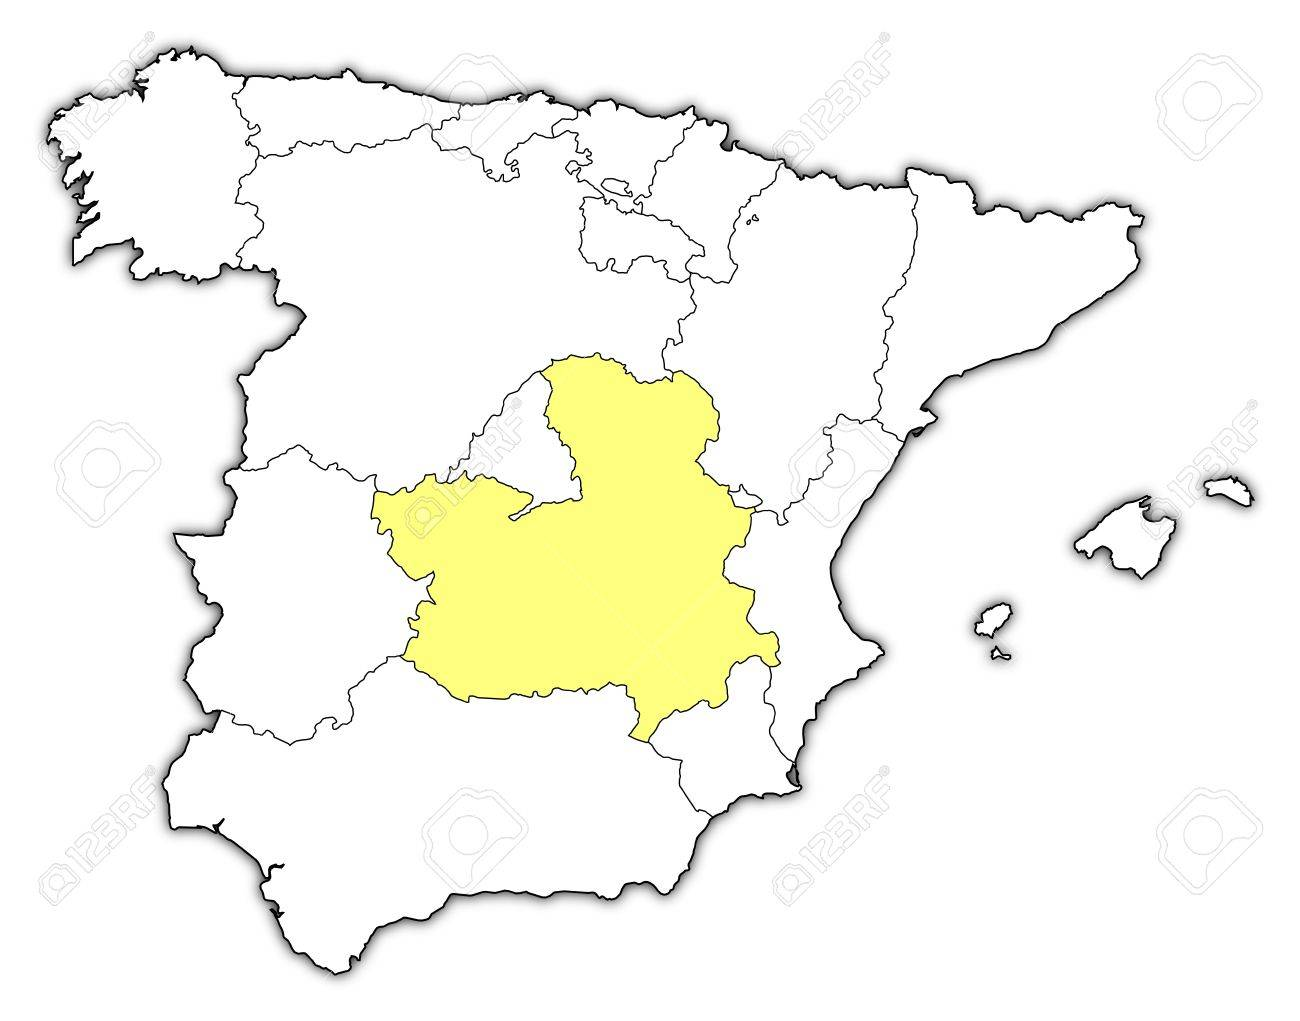 La Mancha Spain Map.Political Map Of Spain With The Several Regions Where Castile La